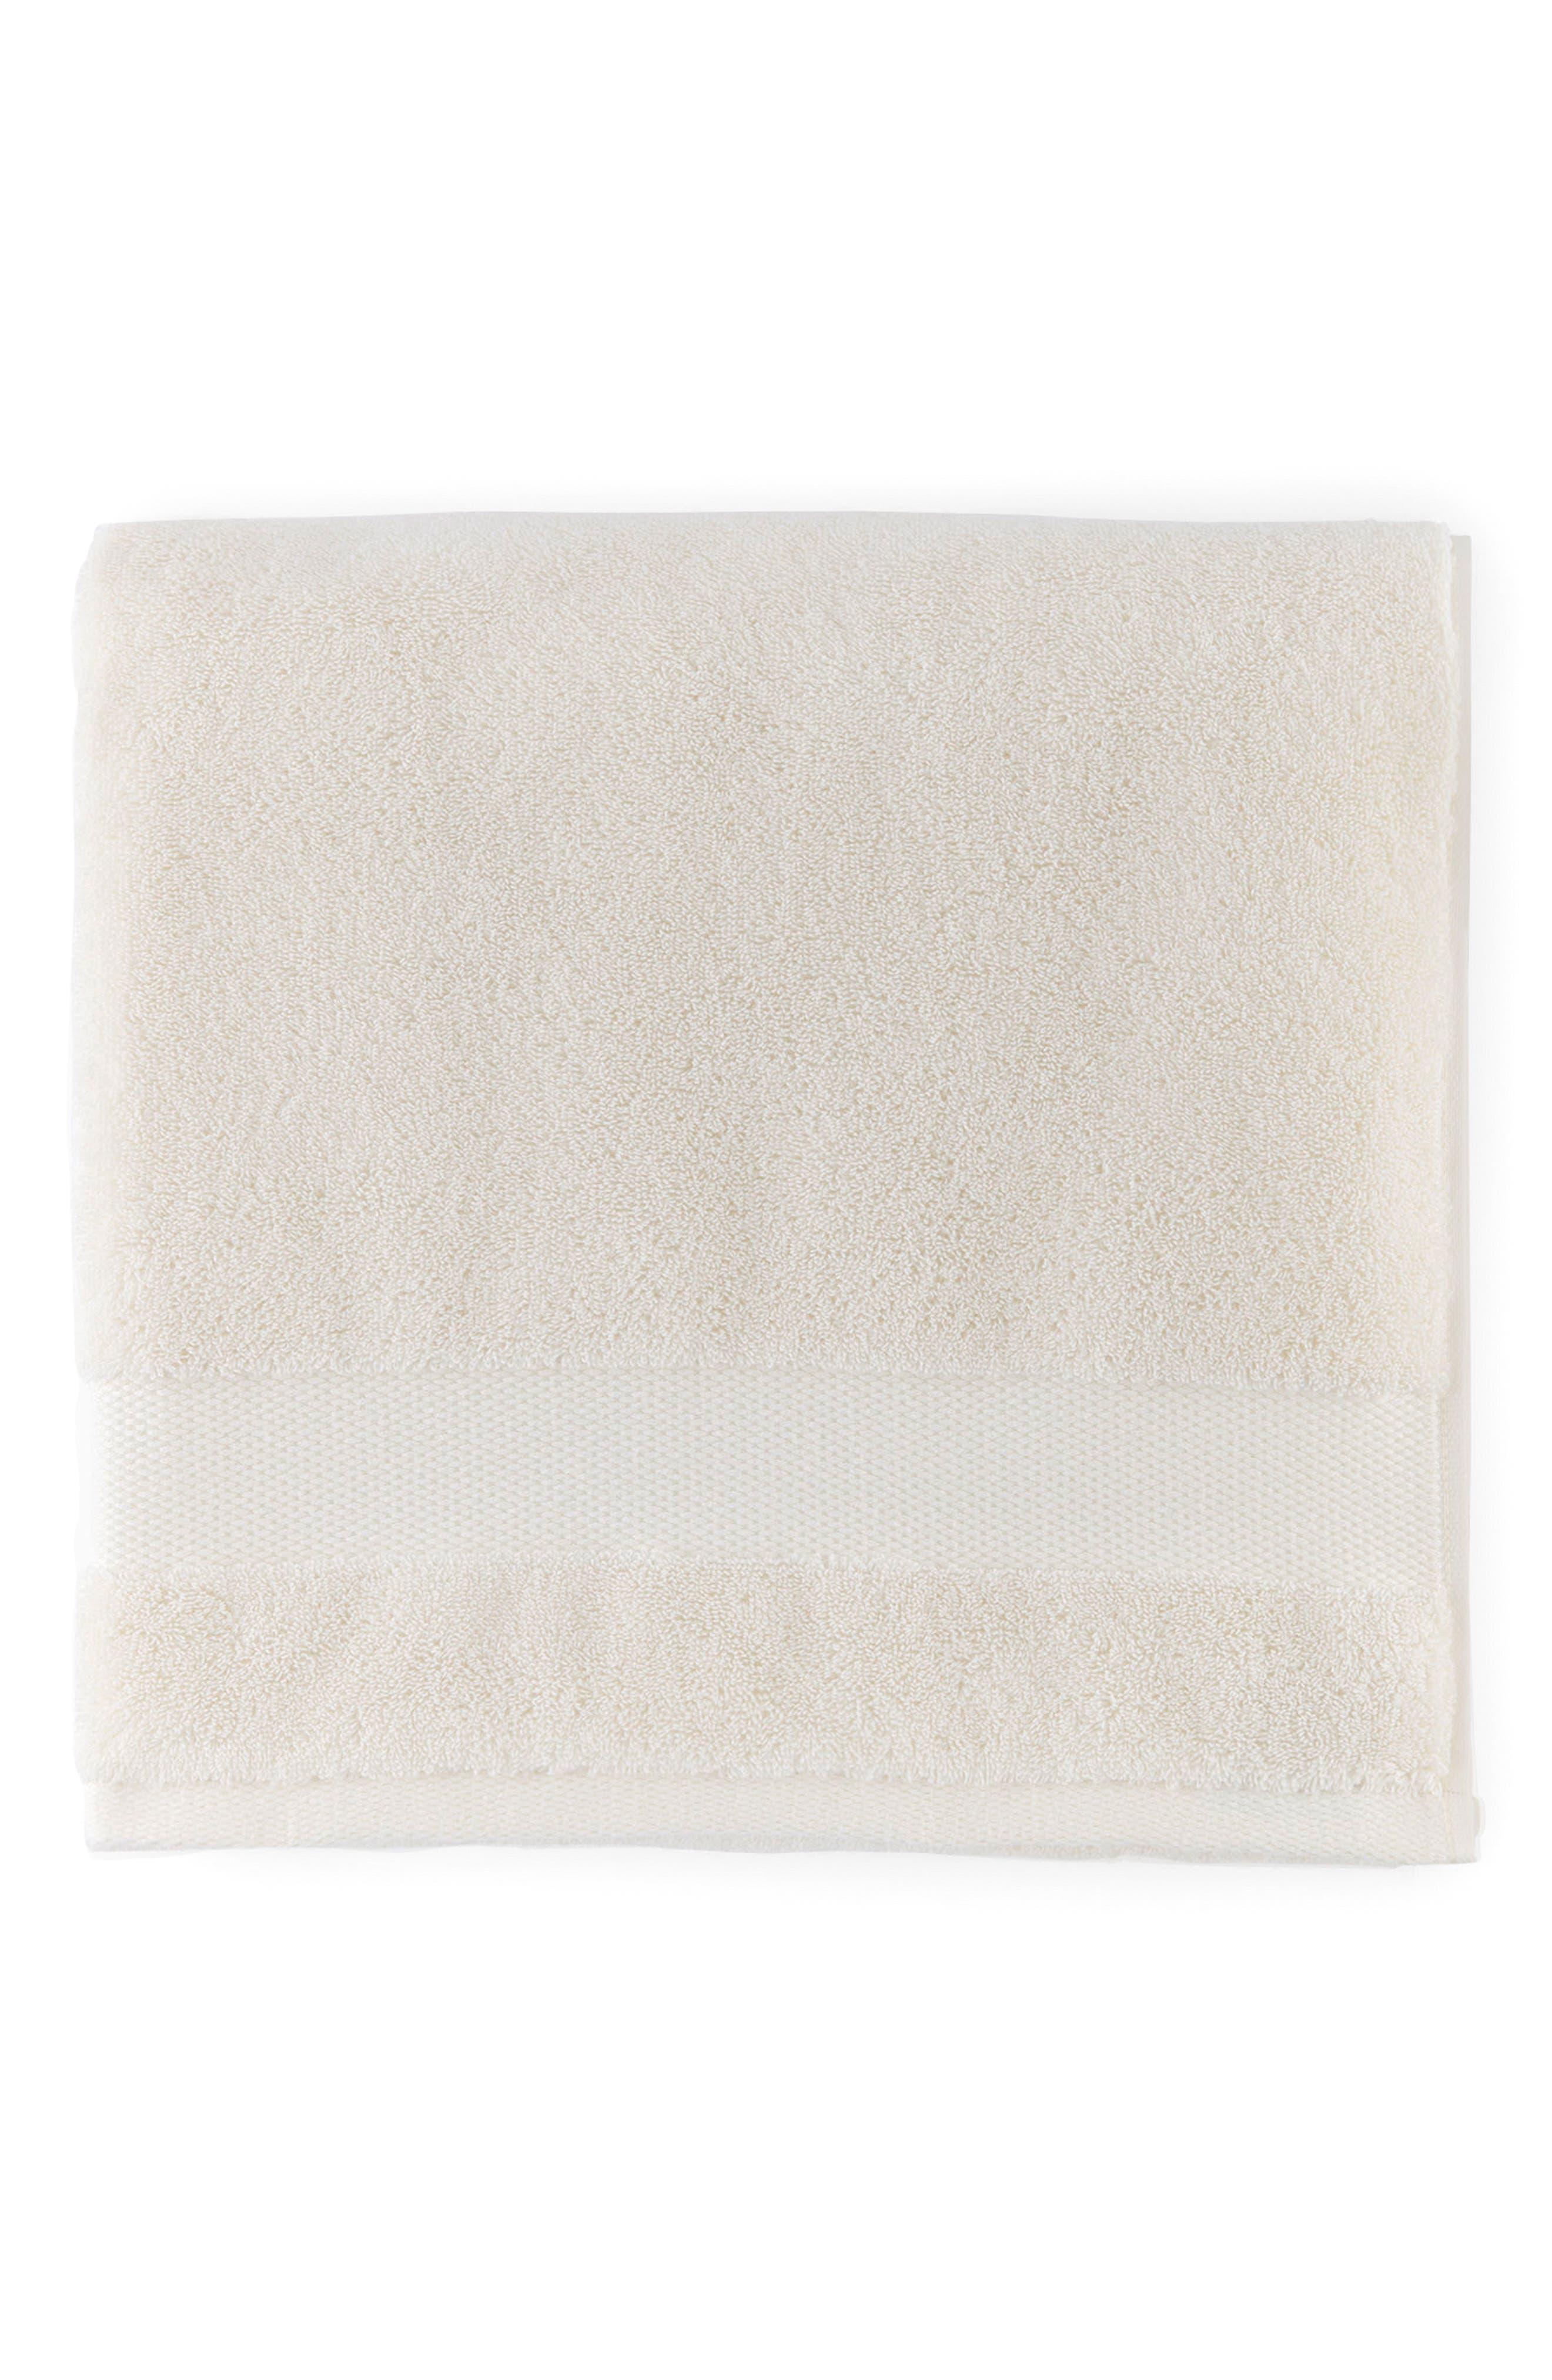 Alternate Image 1 Selected - SFERRA Bello Hand Towel